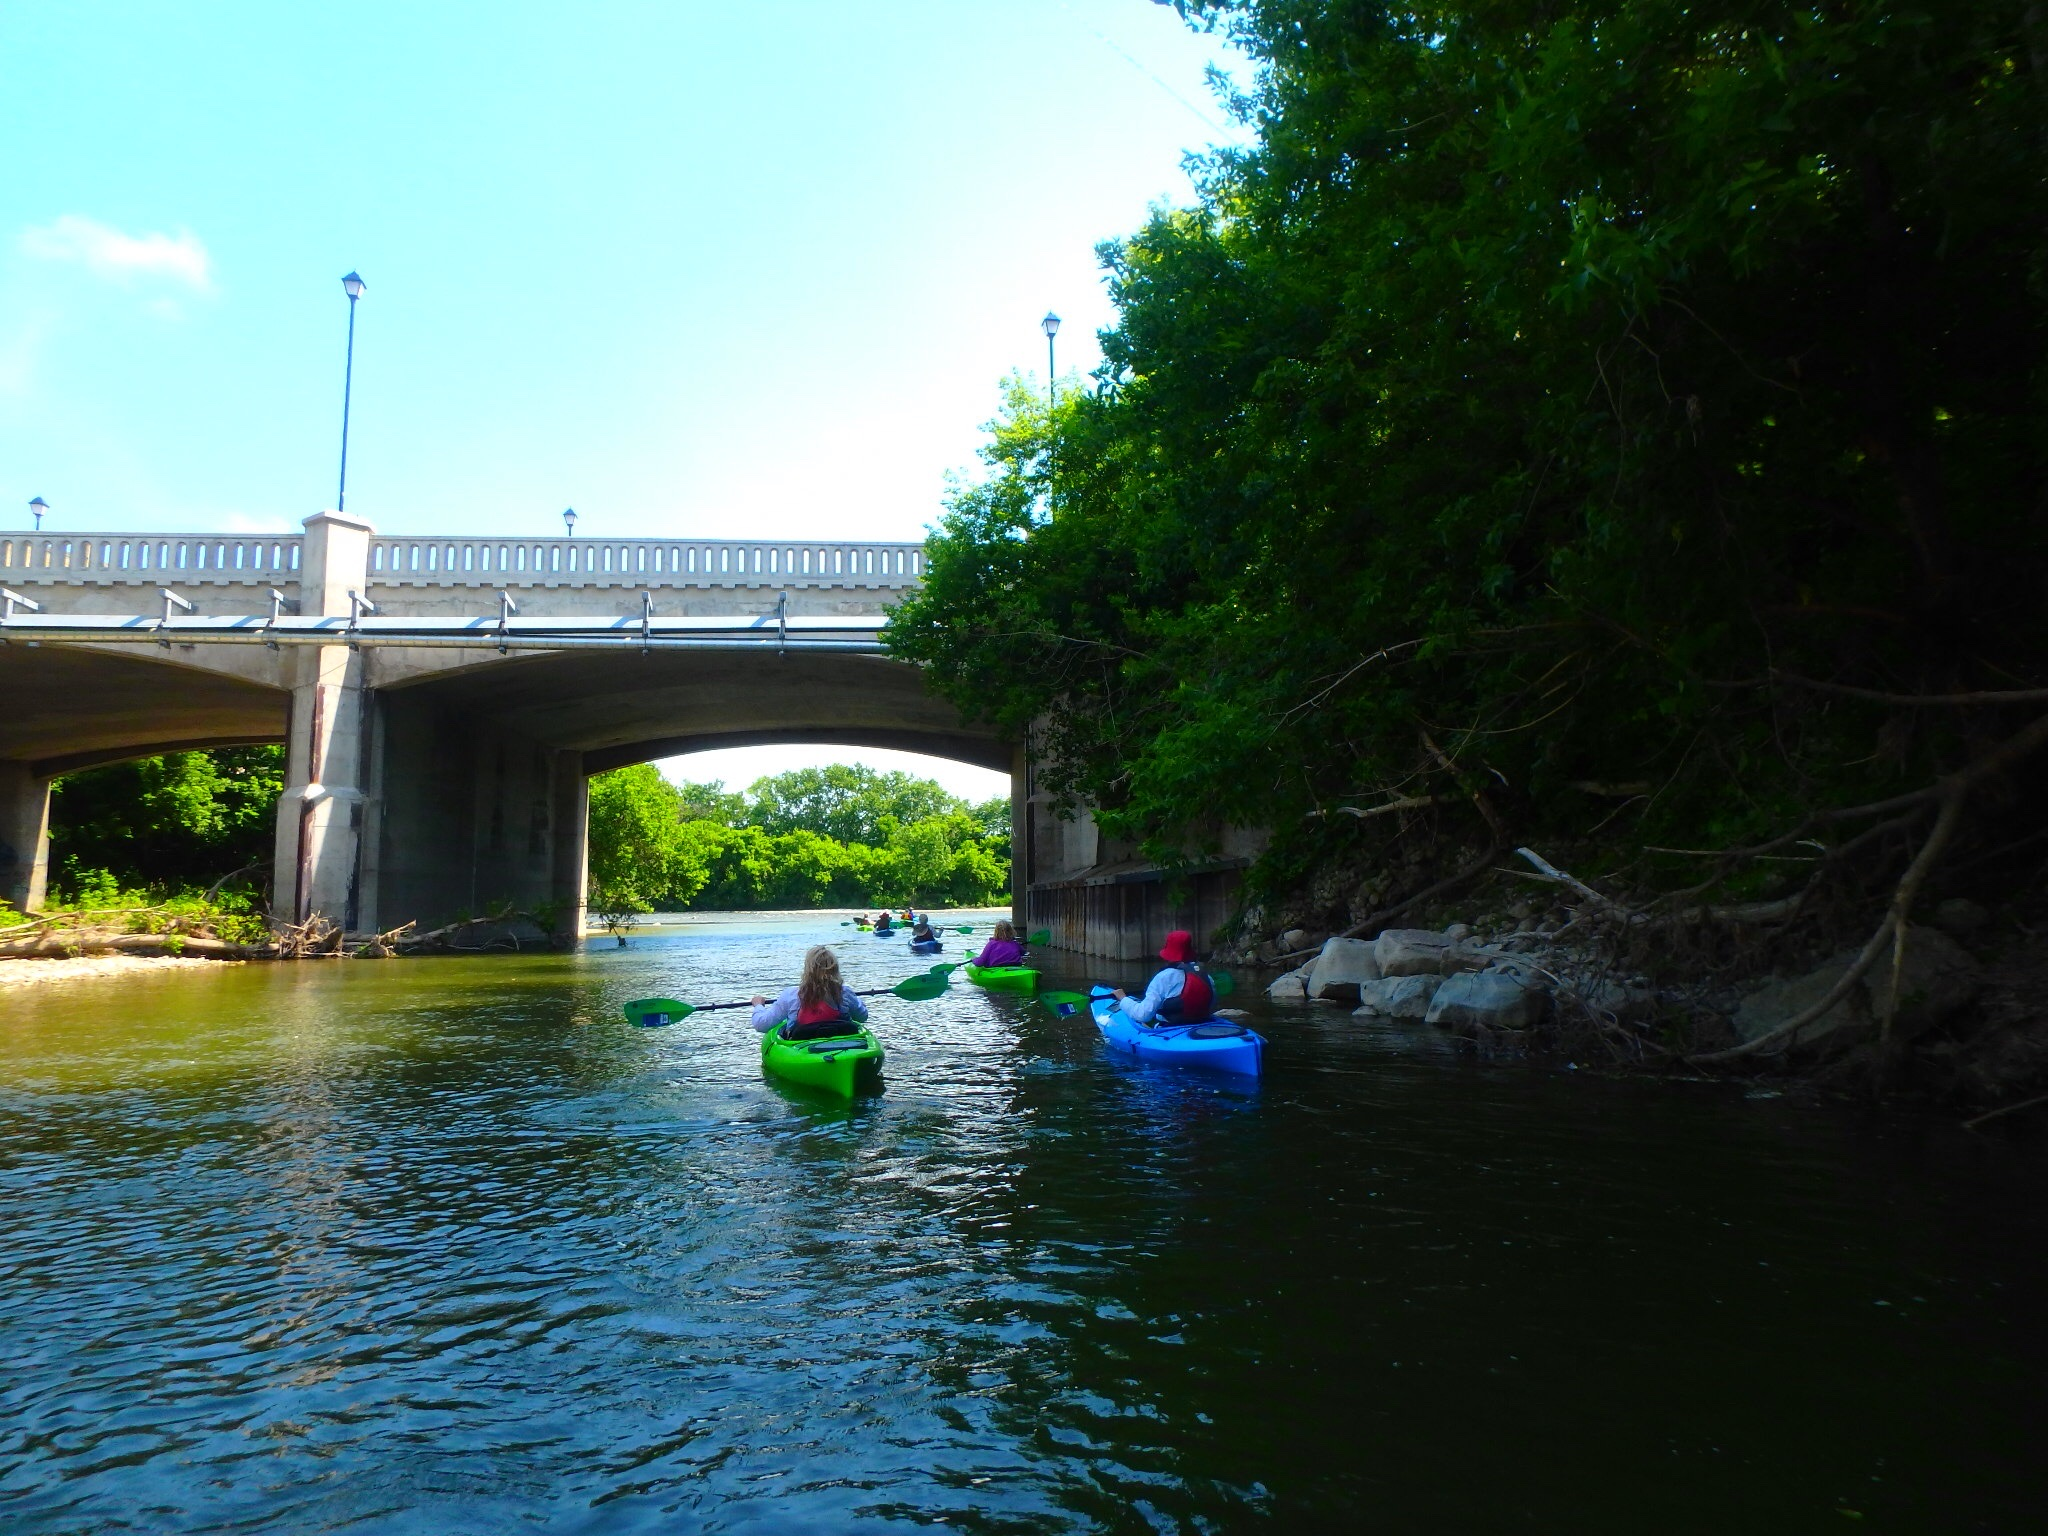 Kayaking Yoga Meditation - Solstice - Jun 21 2018-13